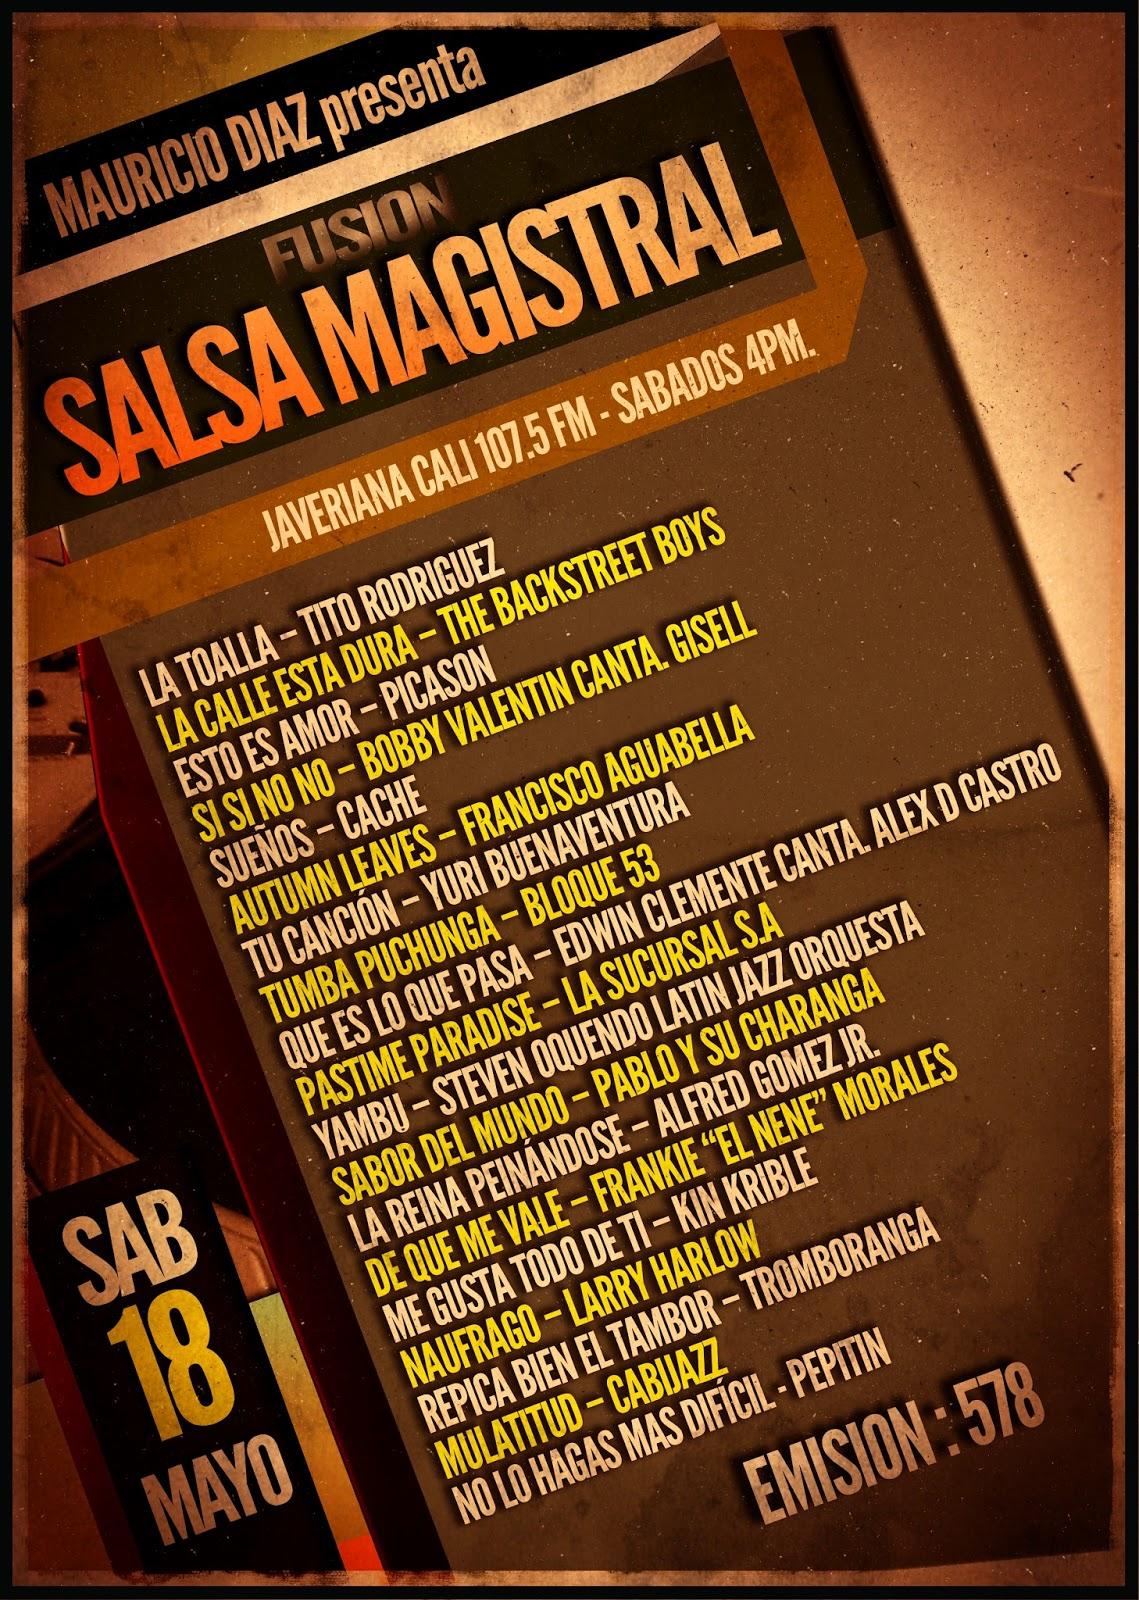 Fusion salsa magistral mayo 18 2013 salsa magistral for Amazon canta tu alex e co